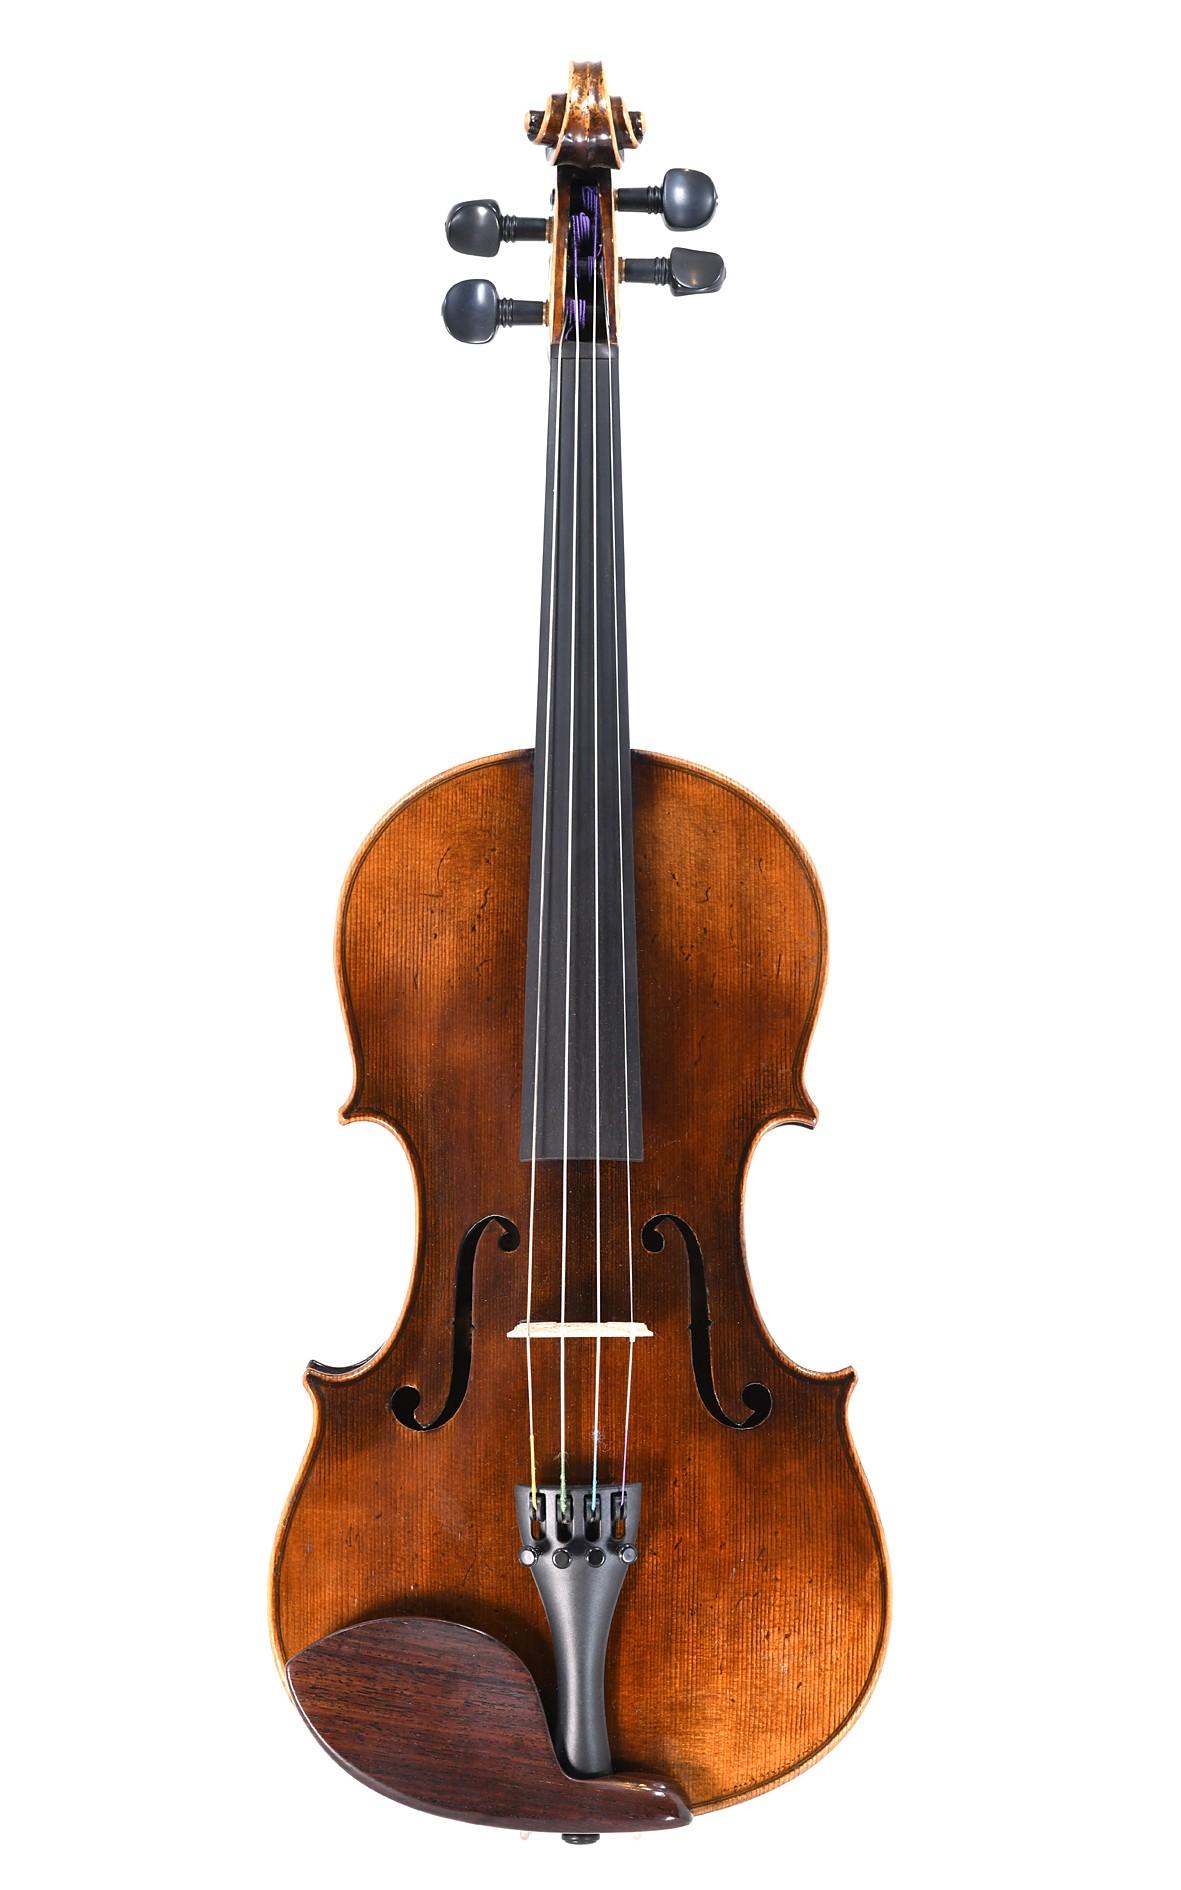 Old Markneukirchen violin with a bright, brilliant sound